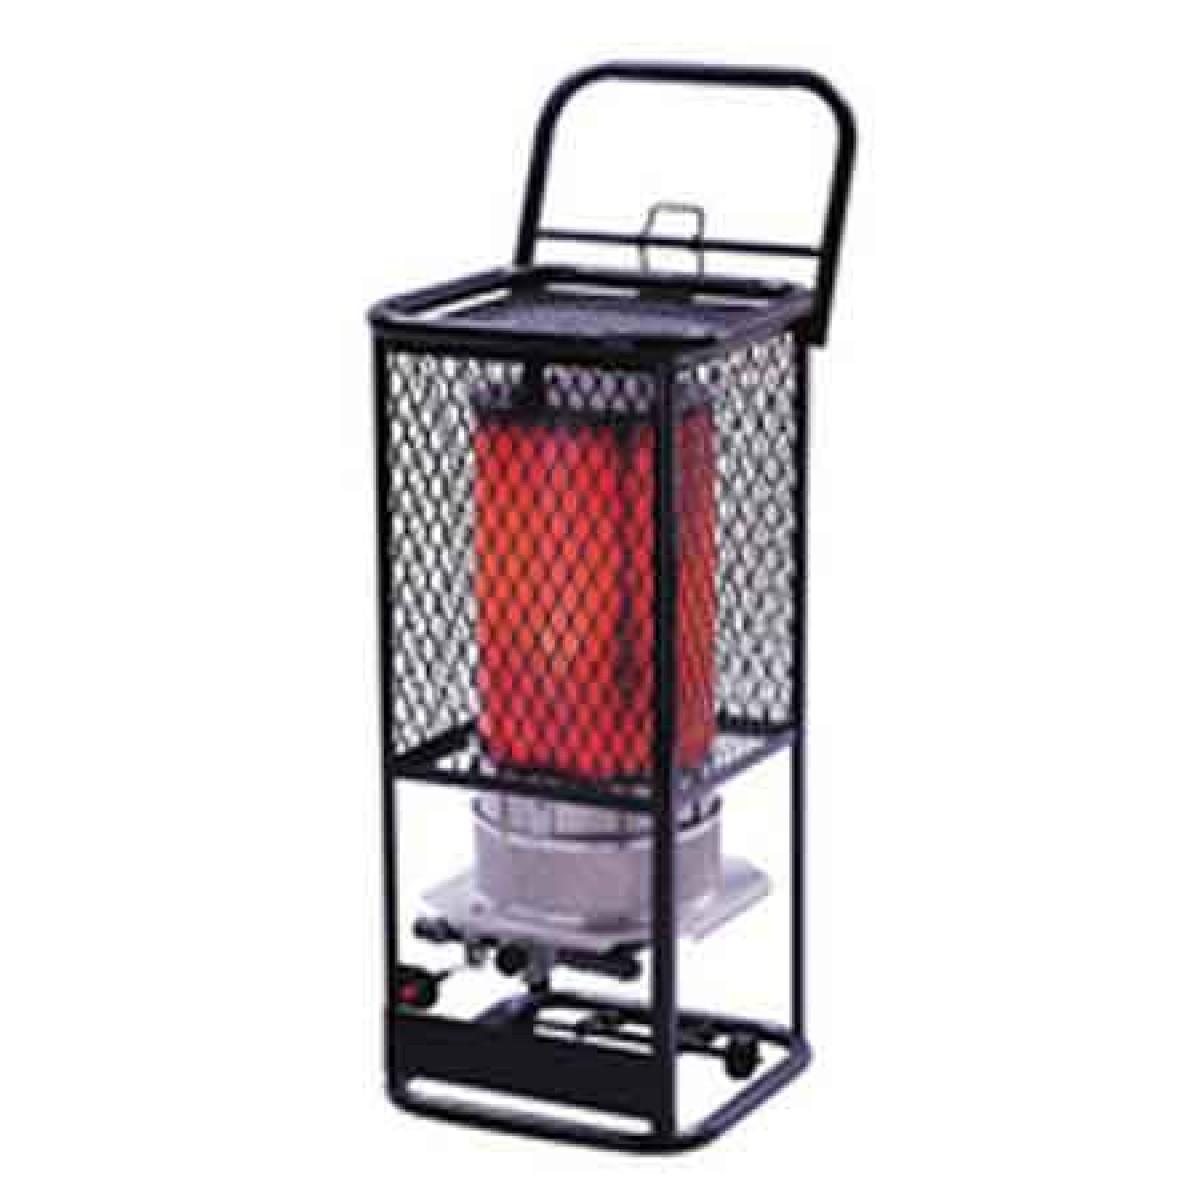 Propane Radiant Heater >> Enerco Heatstar Hs125lp Portable Propane Radiant Heater